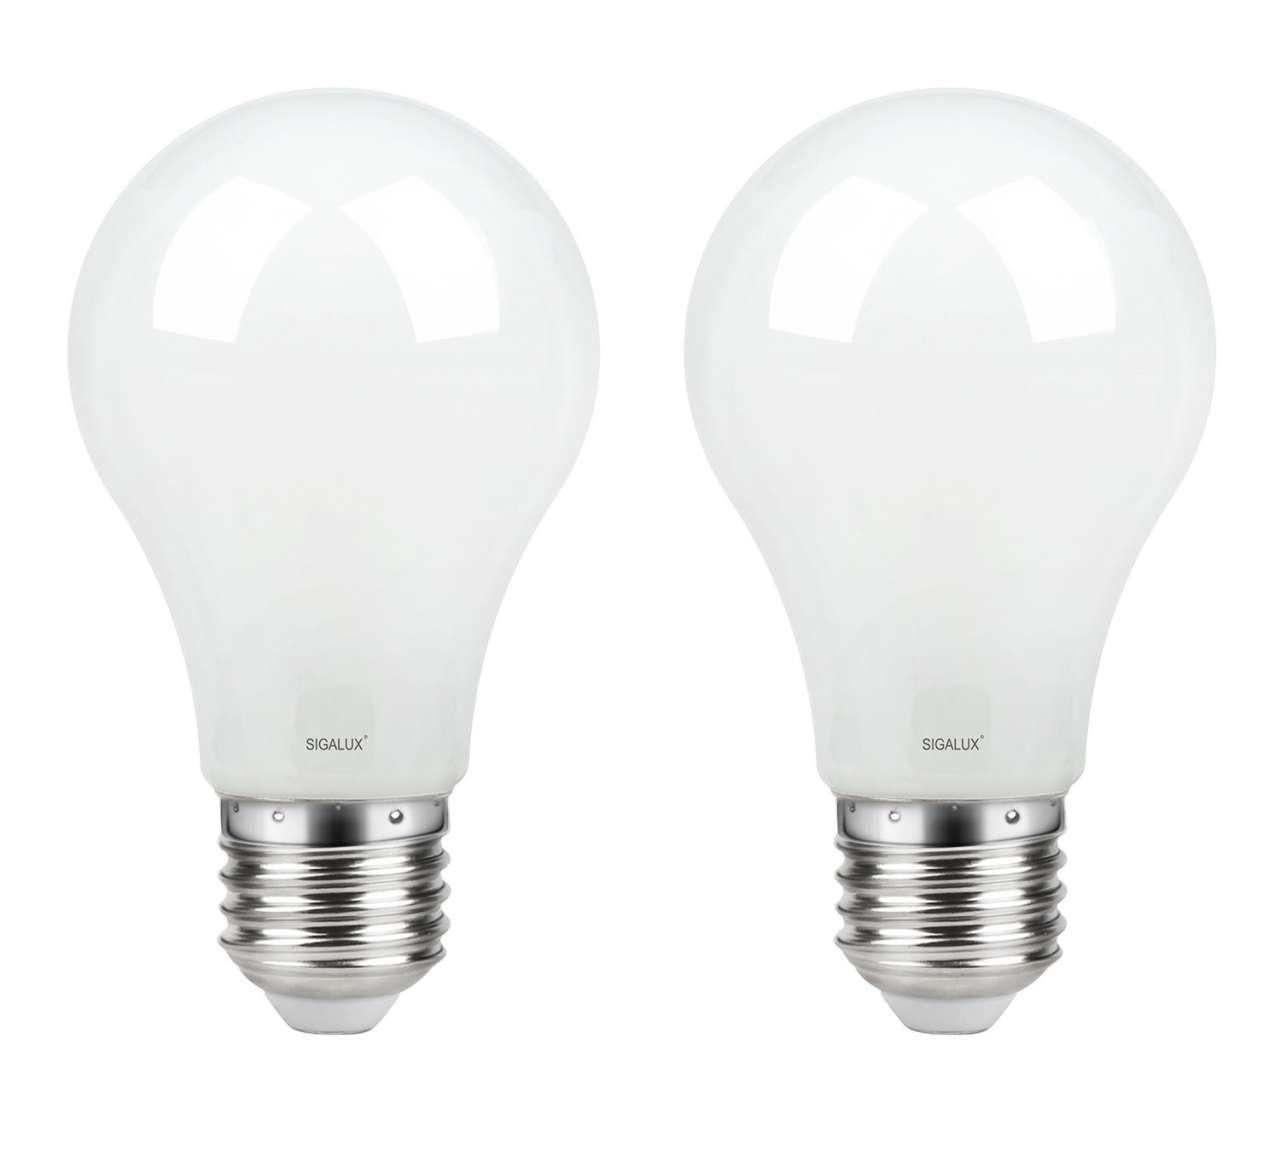 moebel-jack.de 2er-Set LED-Lampe CORALIE 1, E27, 470 Lumen, 2700 Kelvin, EEK A+